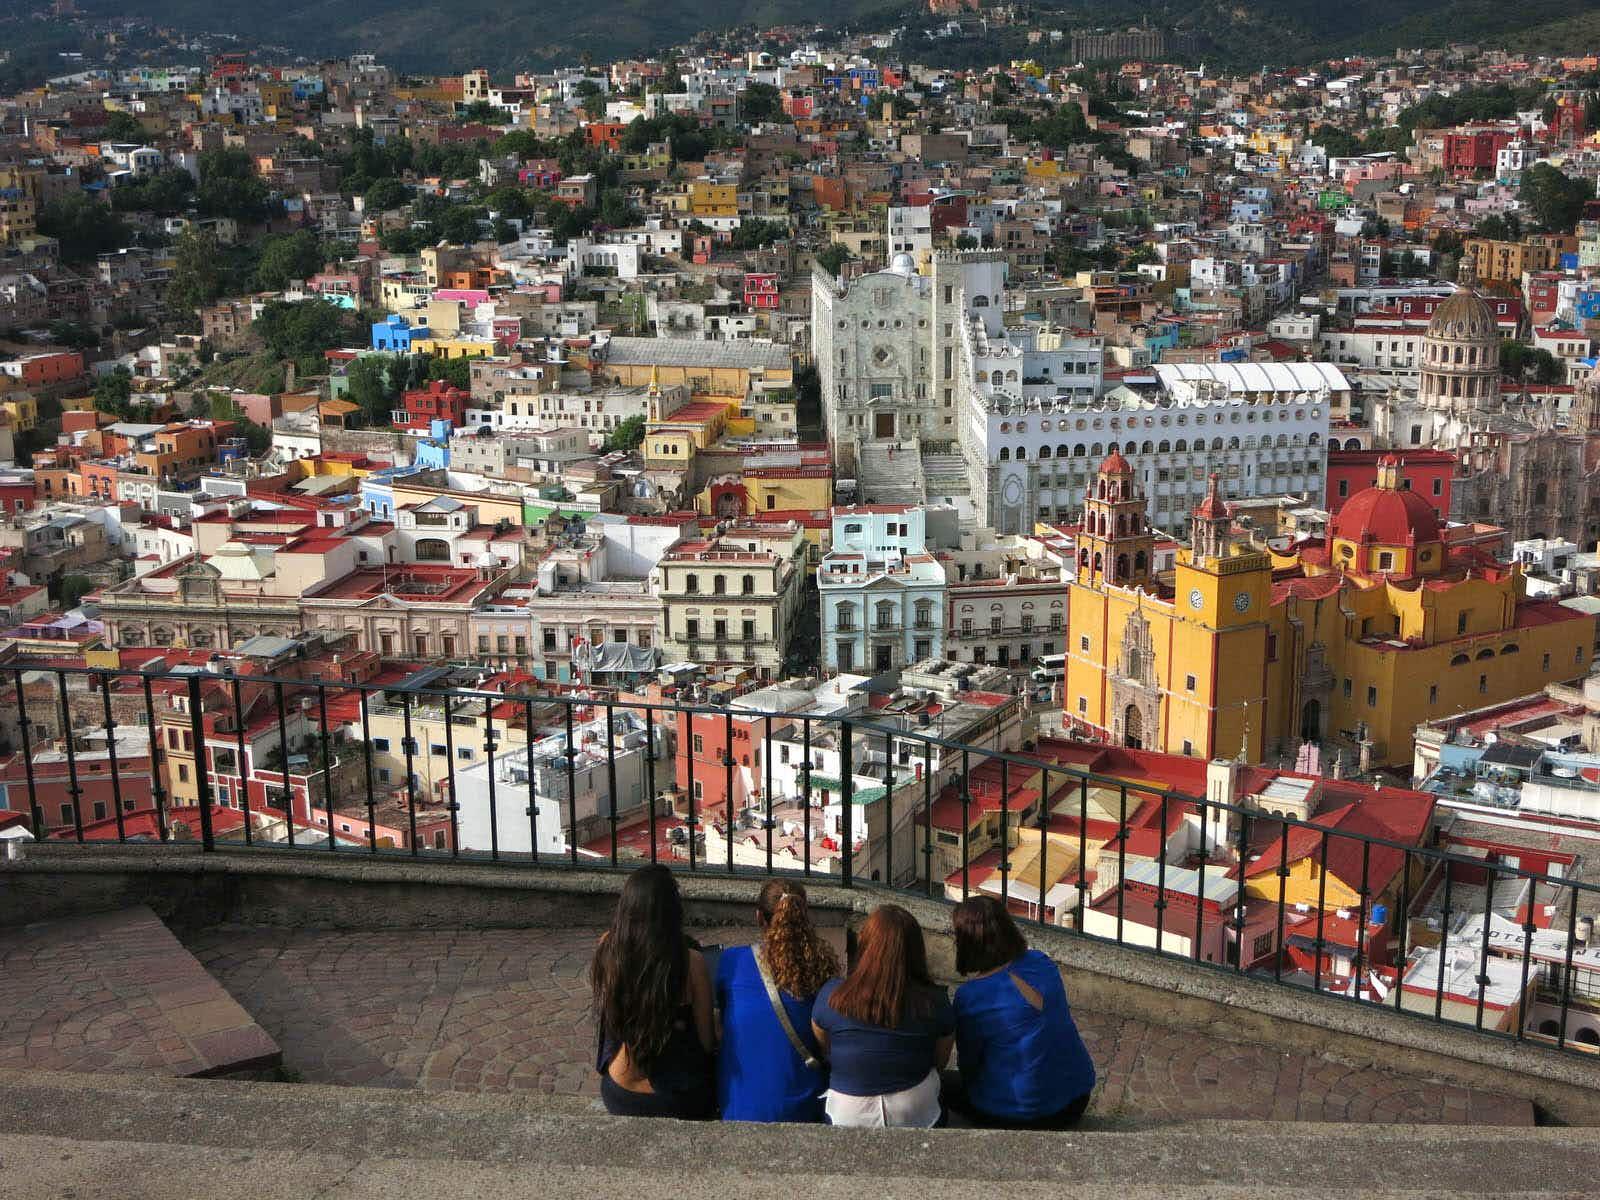 Guanajuato: San Miguel de Allende and beyond